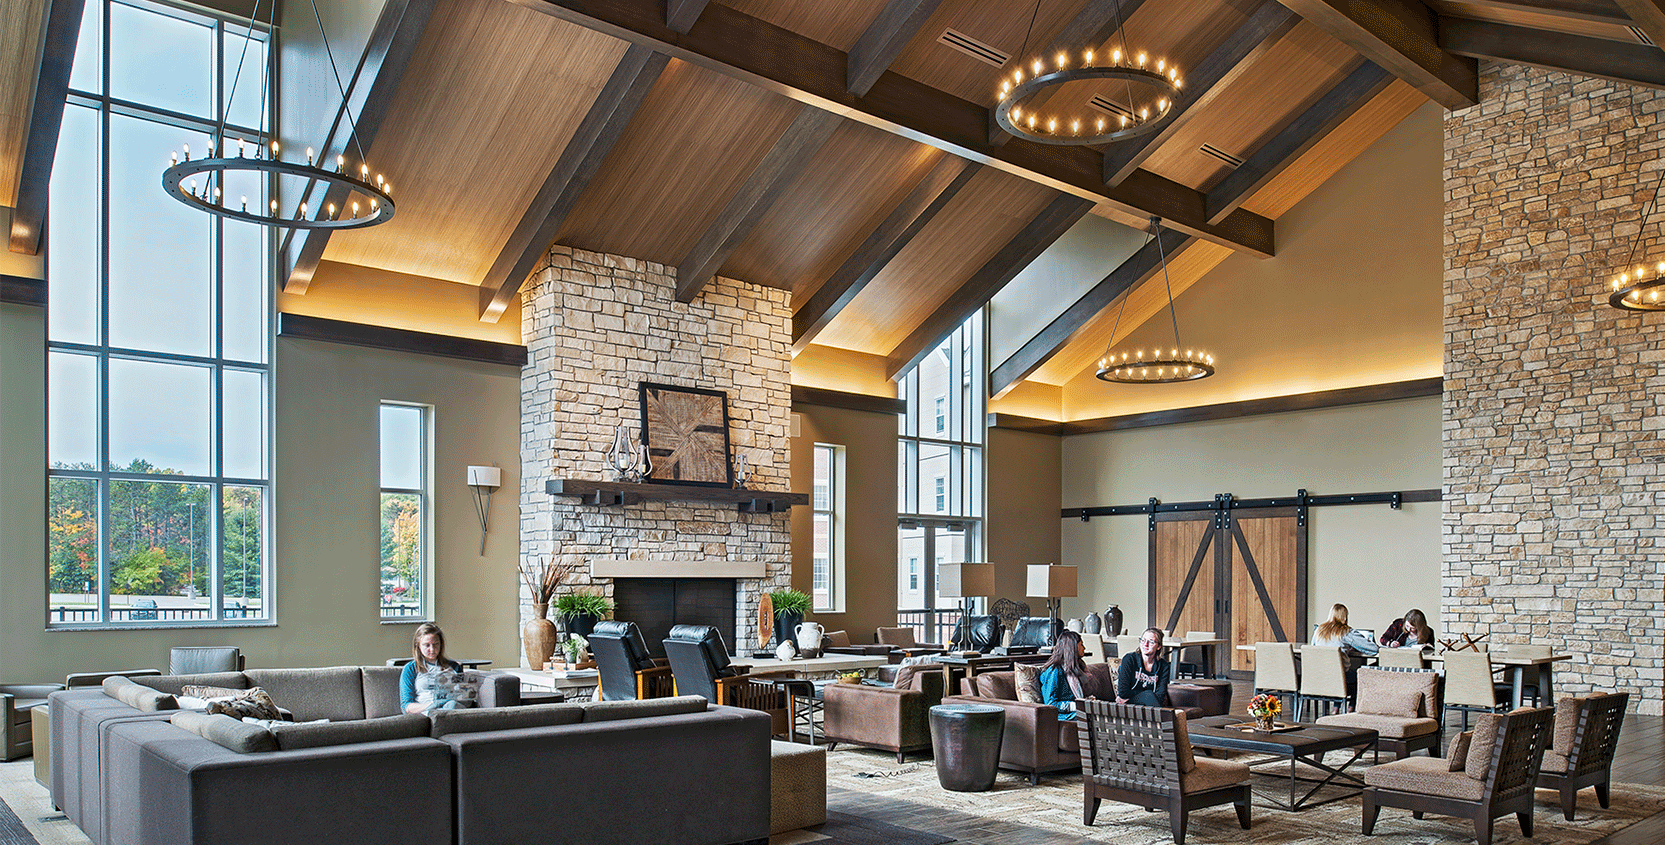 NMU-The-Woods-Fireside-Lounge-2-1665x845